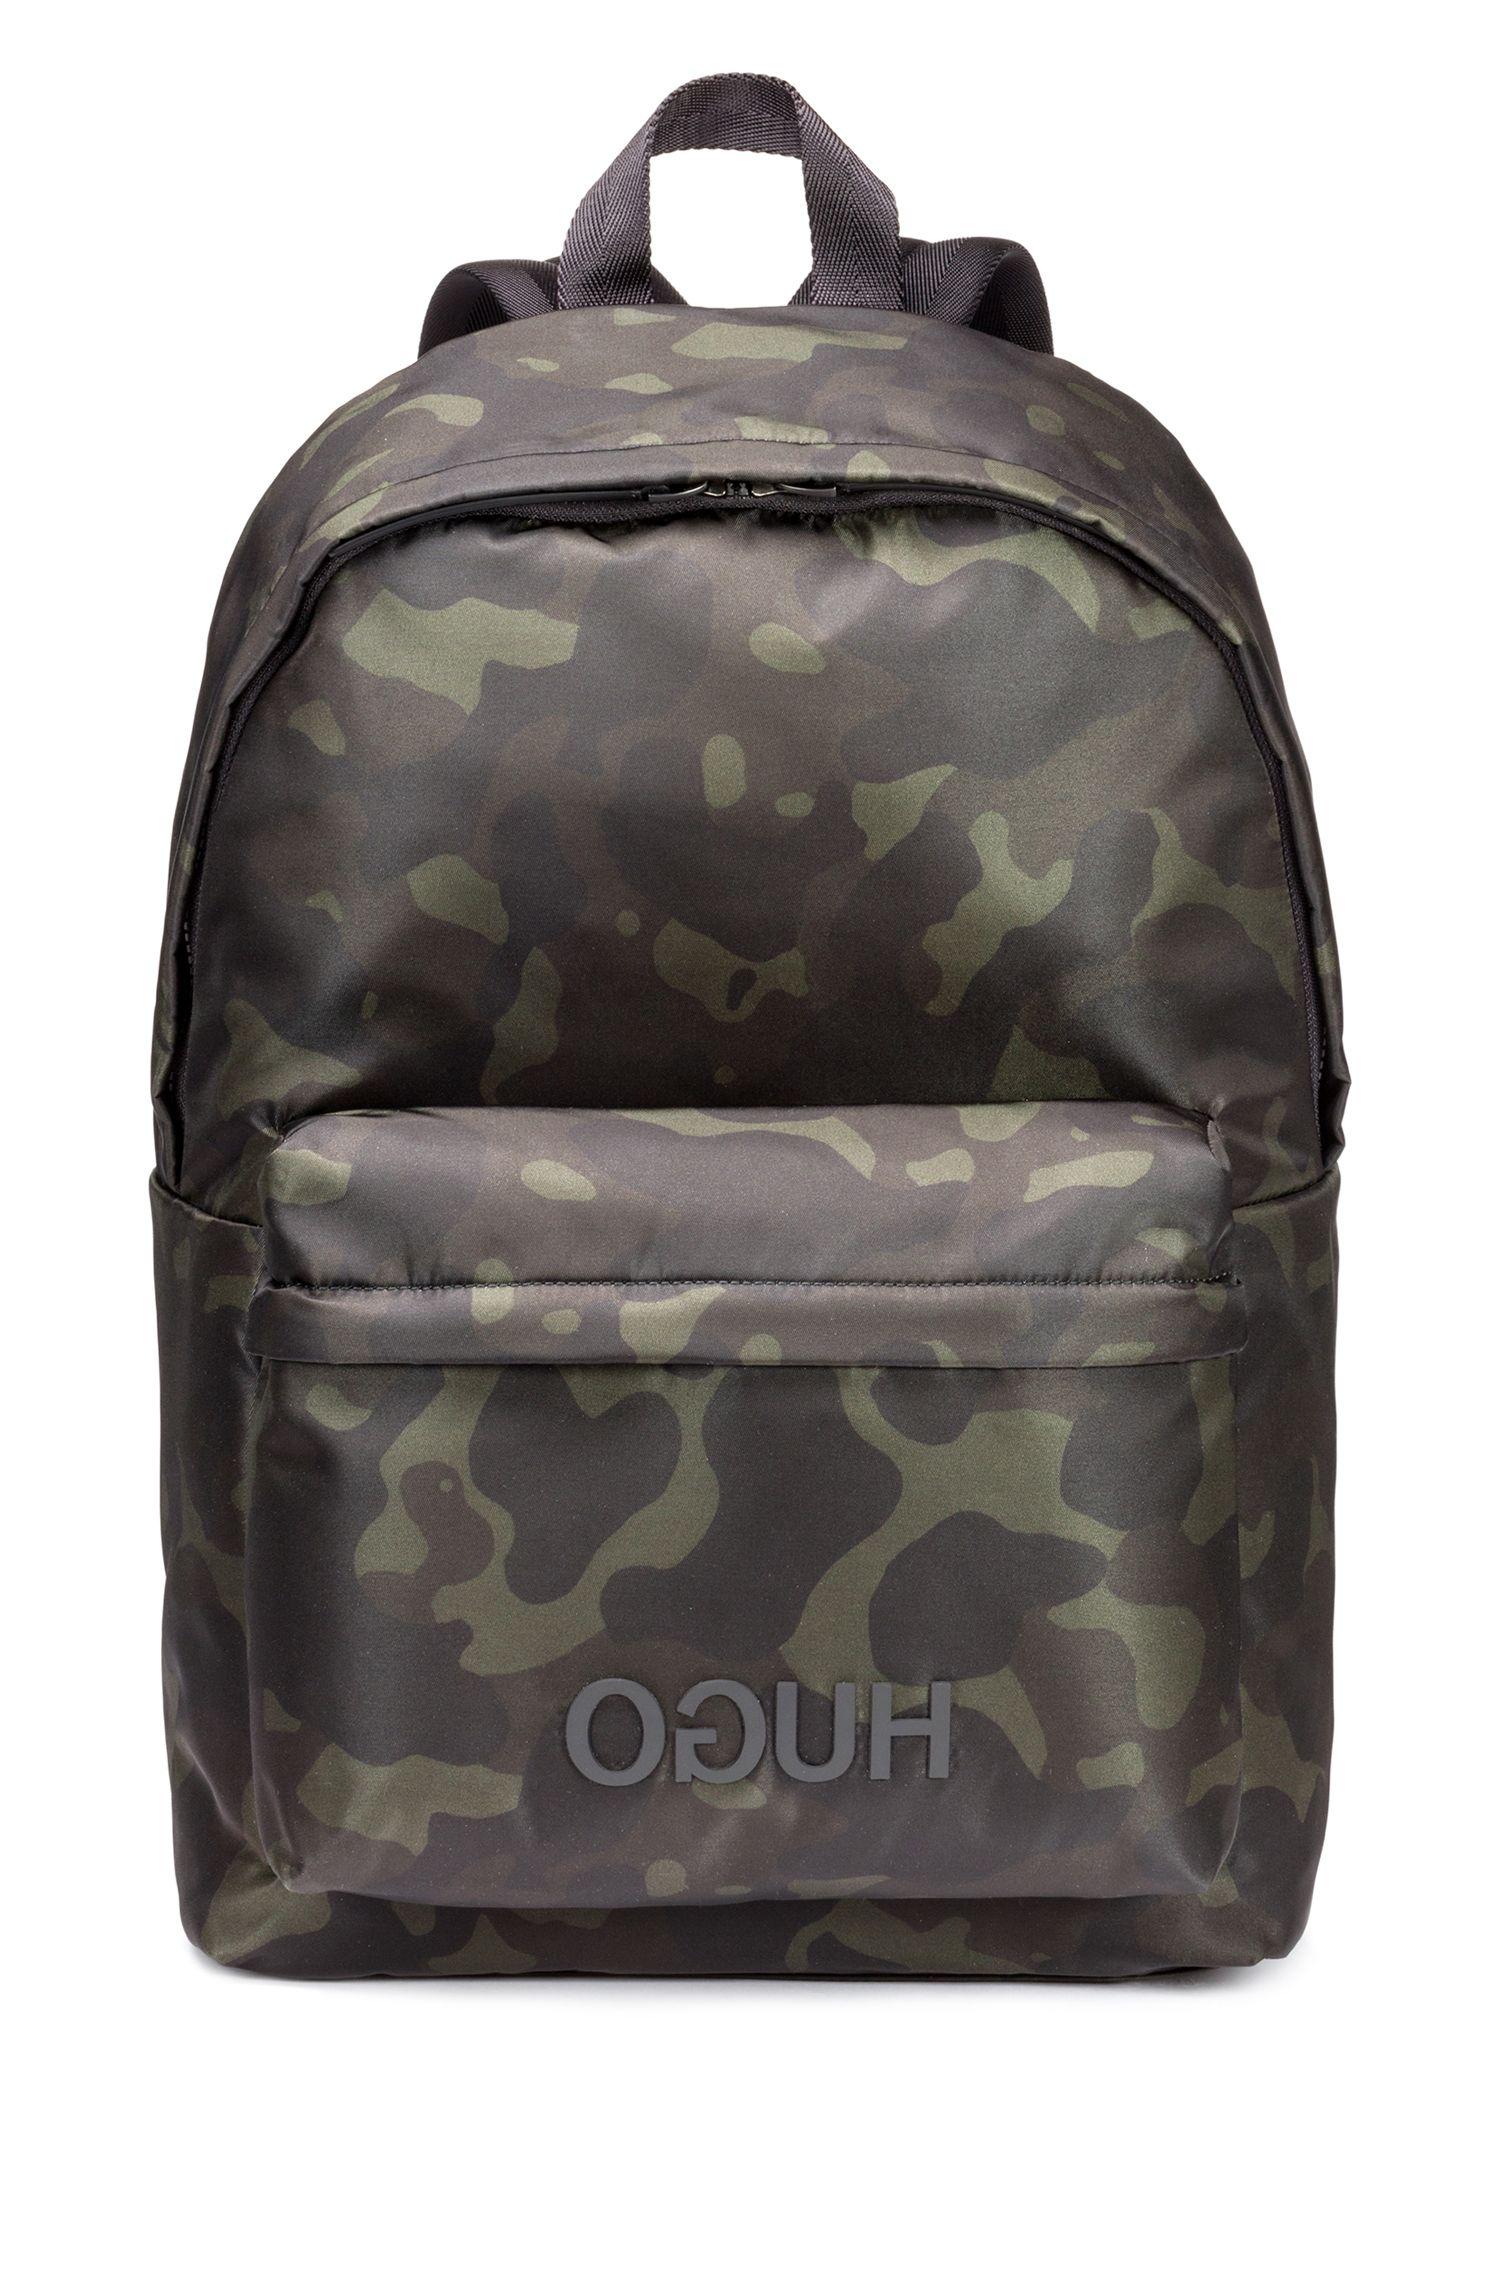 Camouflage-print backpack in nylon gabardine, Patterned